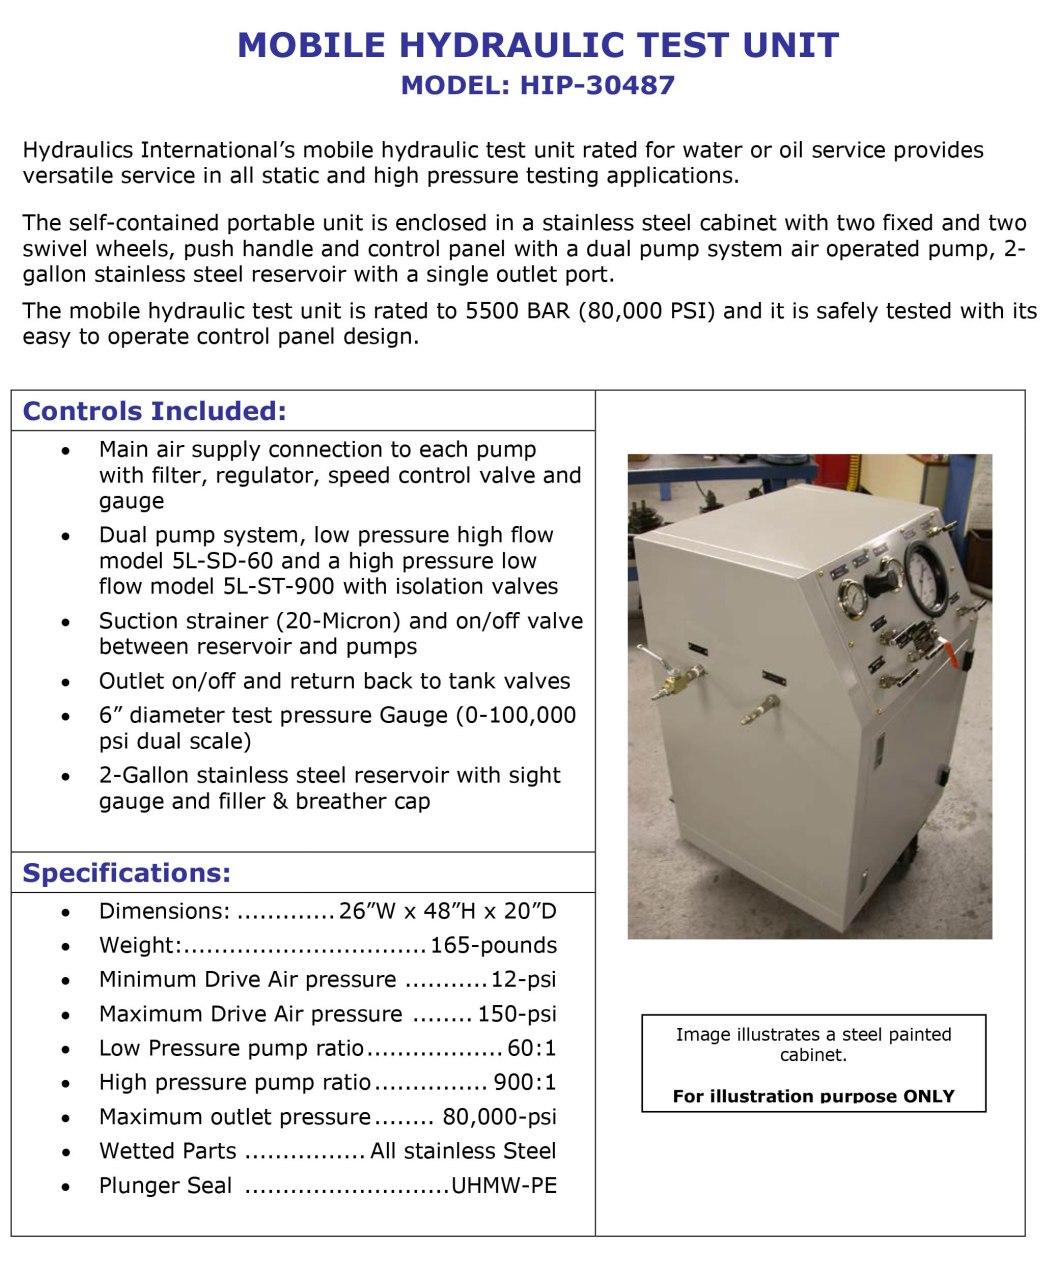 Hydraulic Test Equipment : Hydraulic test equipment